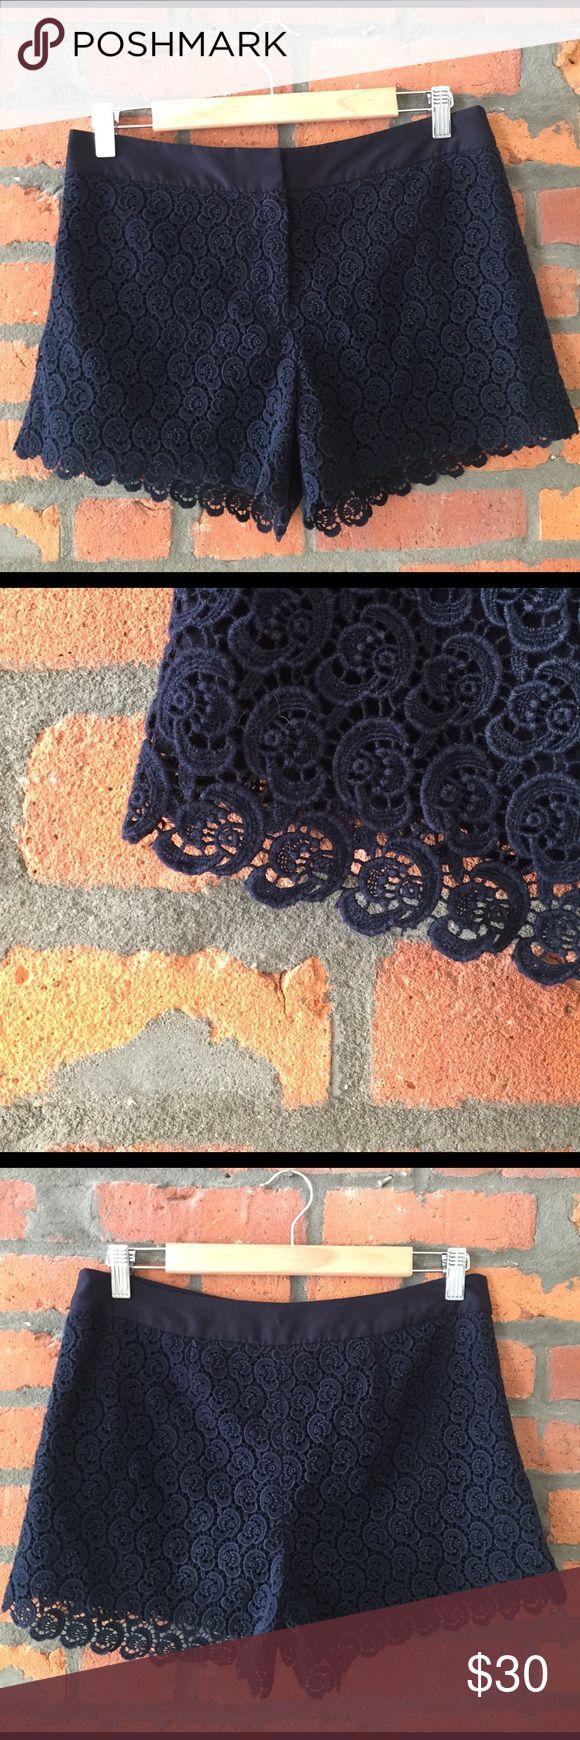 Club Monaco Black Crochet Shorts Black lined crochet shorts with double hook + button closure Club Monaco Shorts